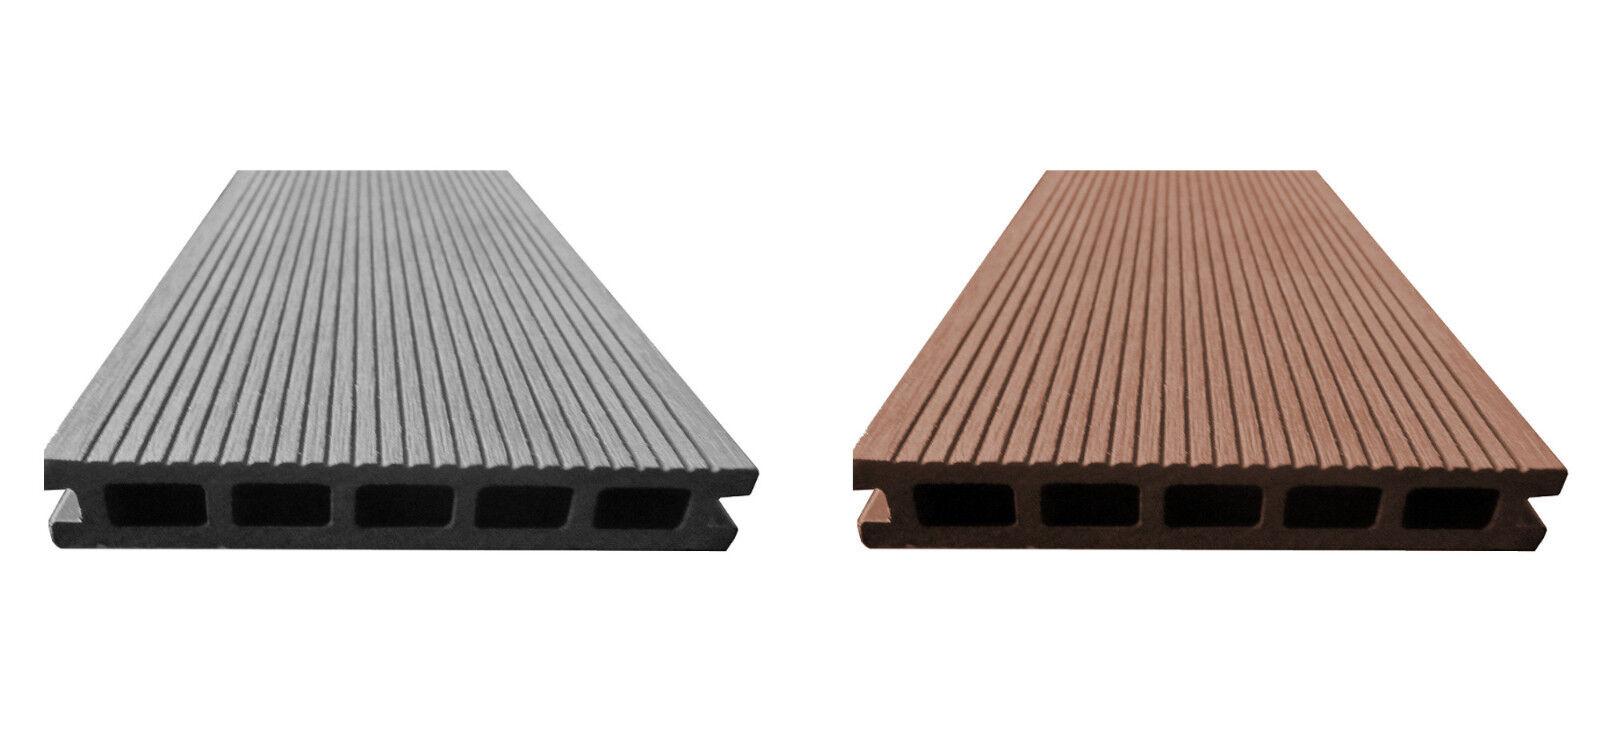 bpc komplettset terrassendielen grau o bangkirai braun komplettbausatz holz wpc ebay. Black Bedroom Furniture Sets. Home Design Ideas